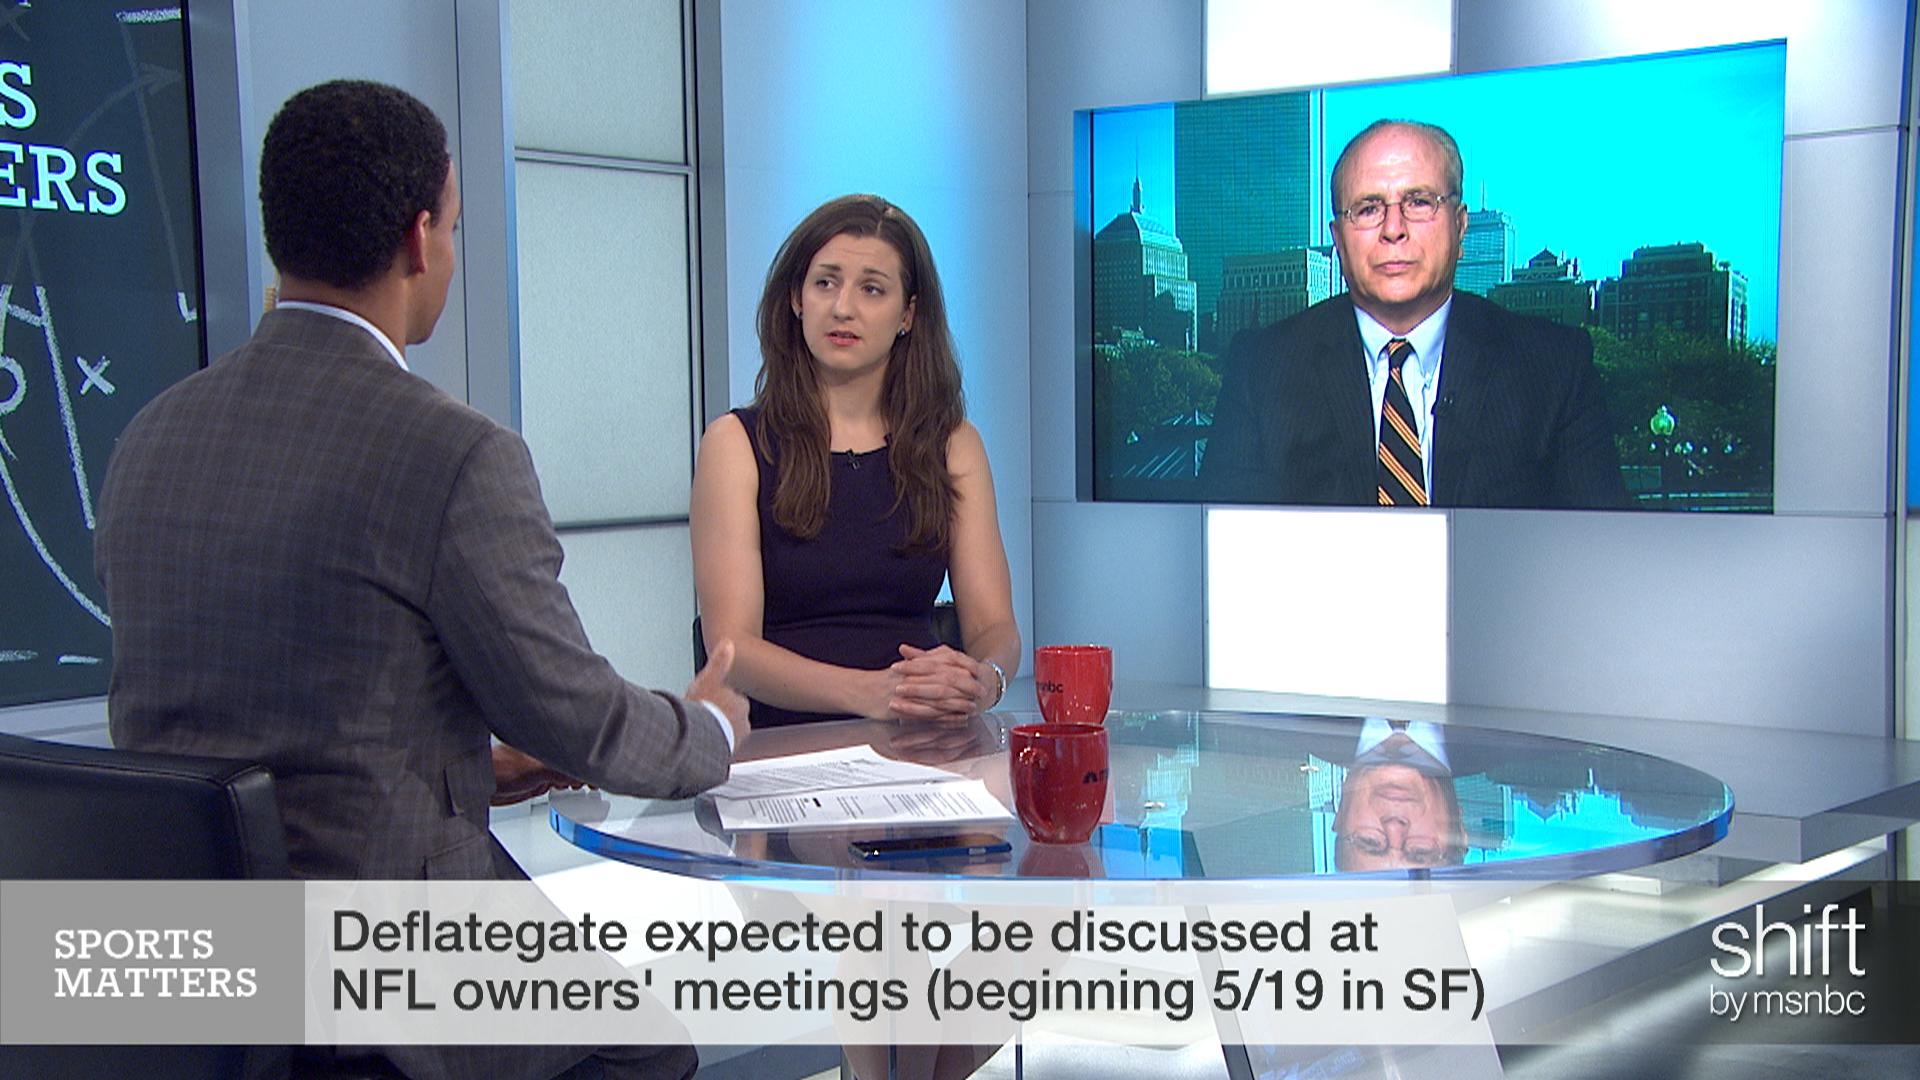 Deflategate settlement possibility?